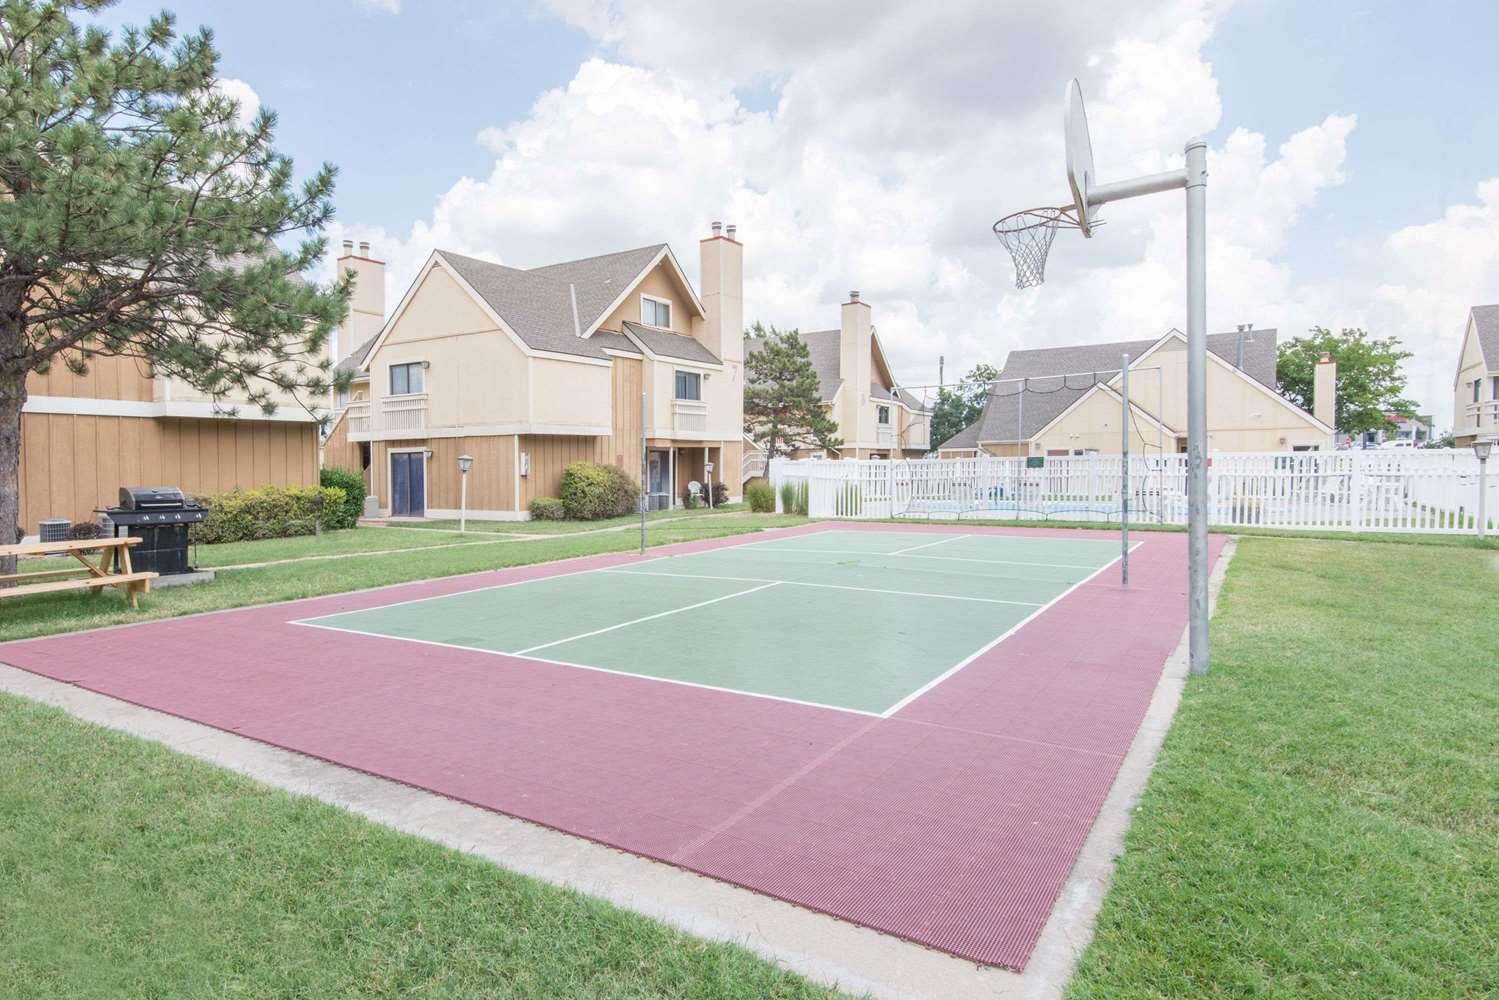 Recreation - Hawthorn Suites by Wyndham East Wichita